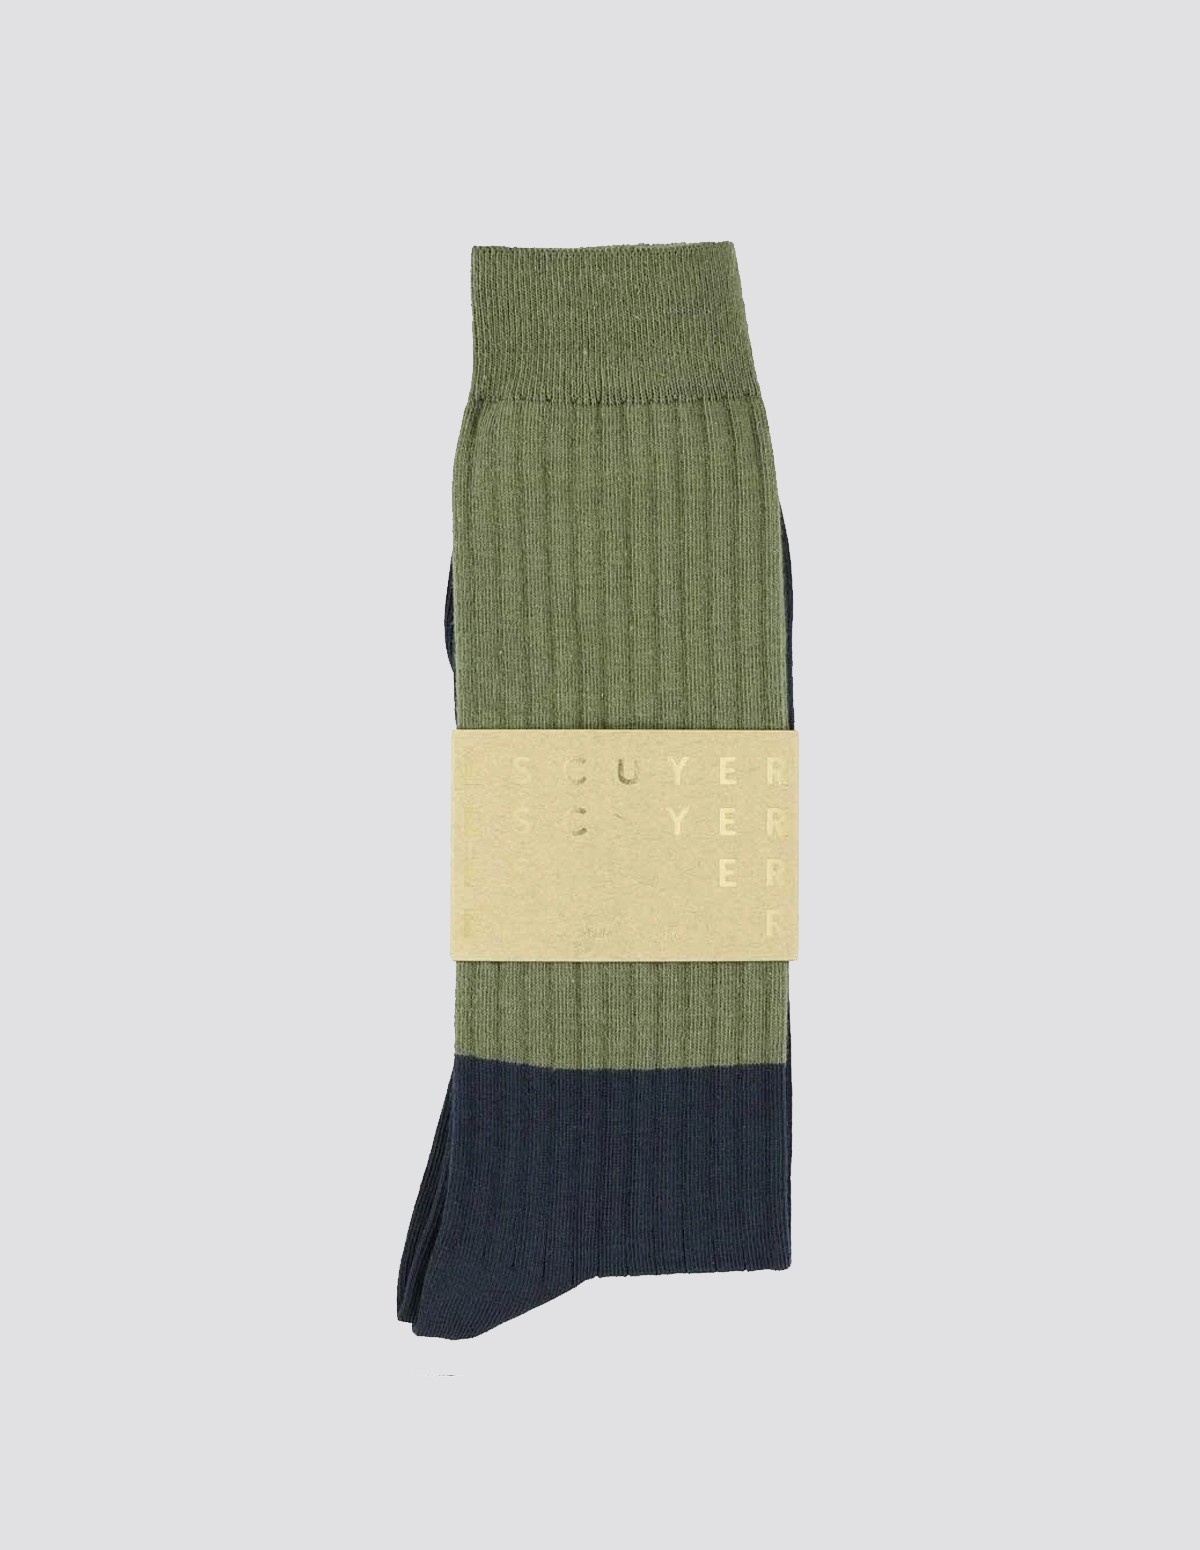 Escuyer Colour Block Socks - OLIVE/INDIGO